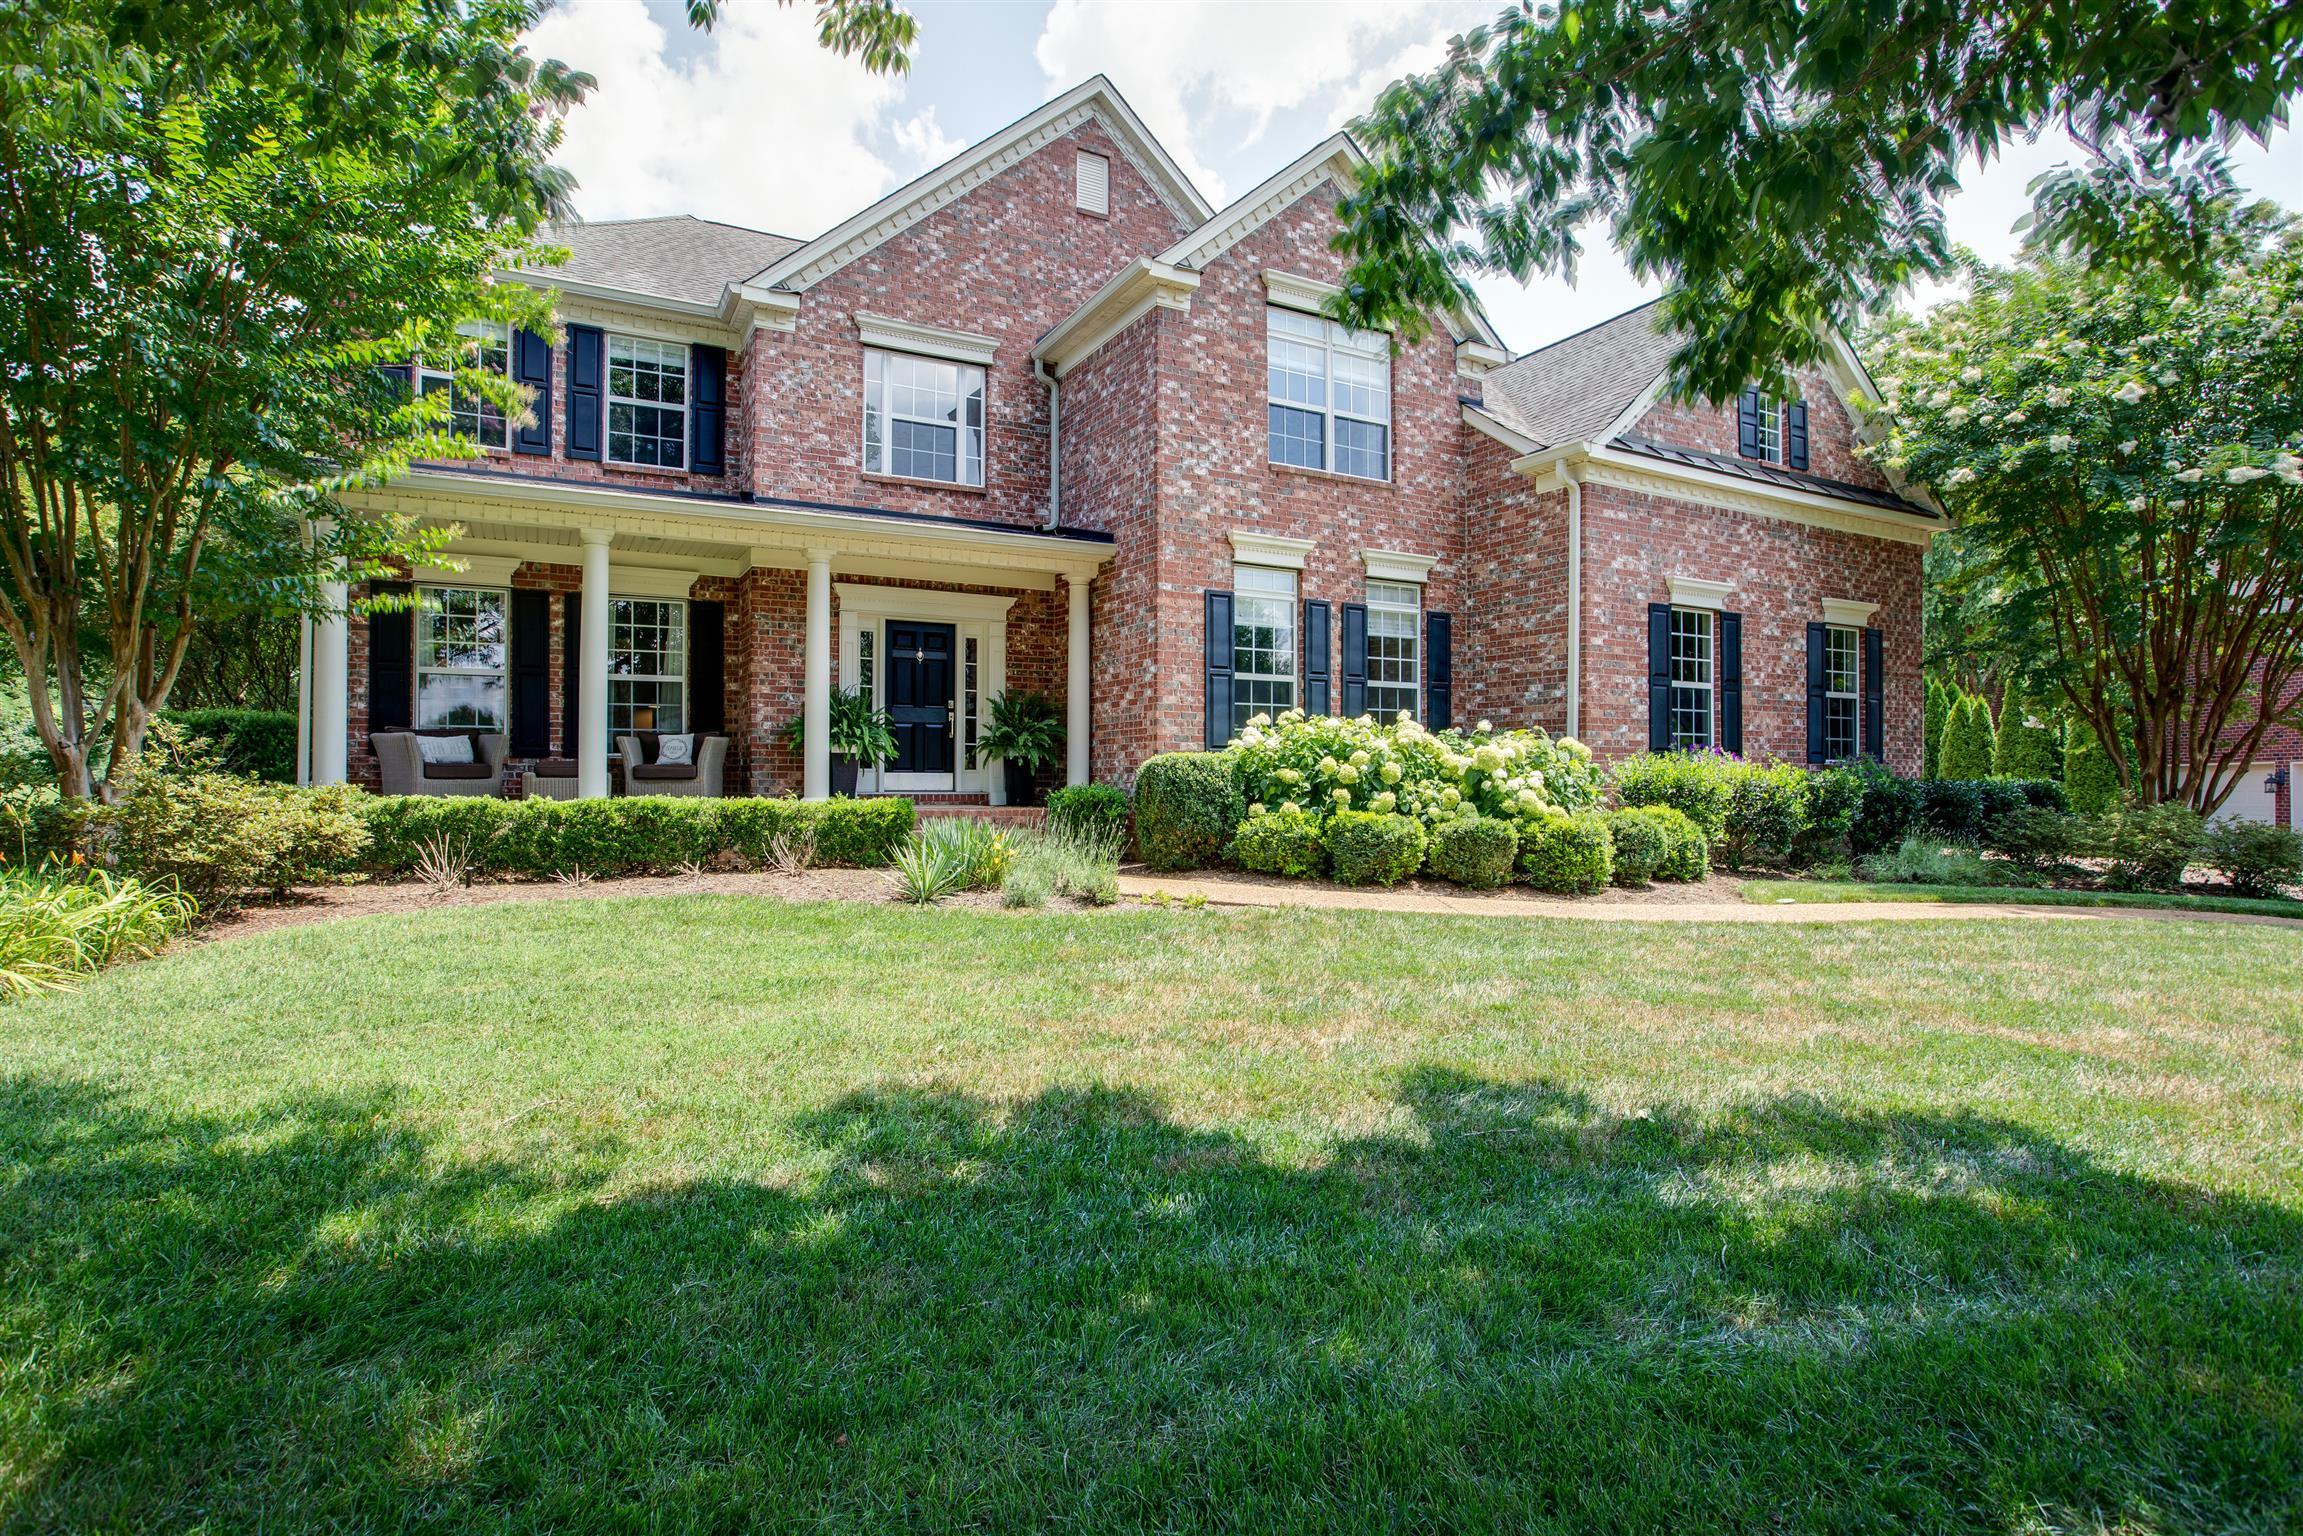 656 Aylesford Ln, Franklin, TN 37069 - Franklin, TN real estate listing